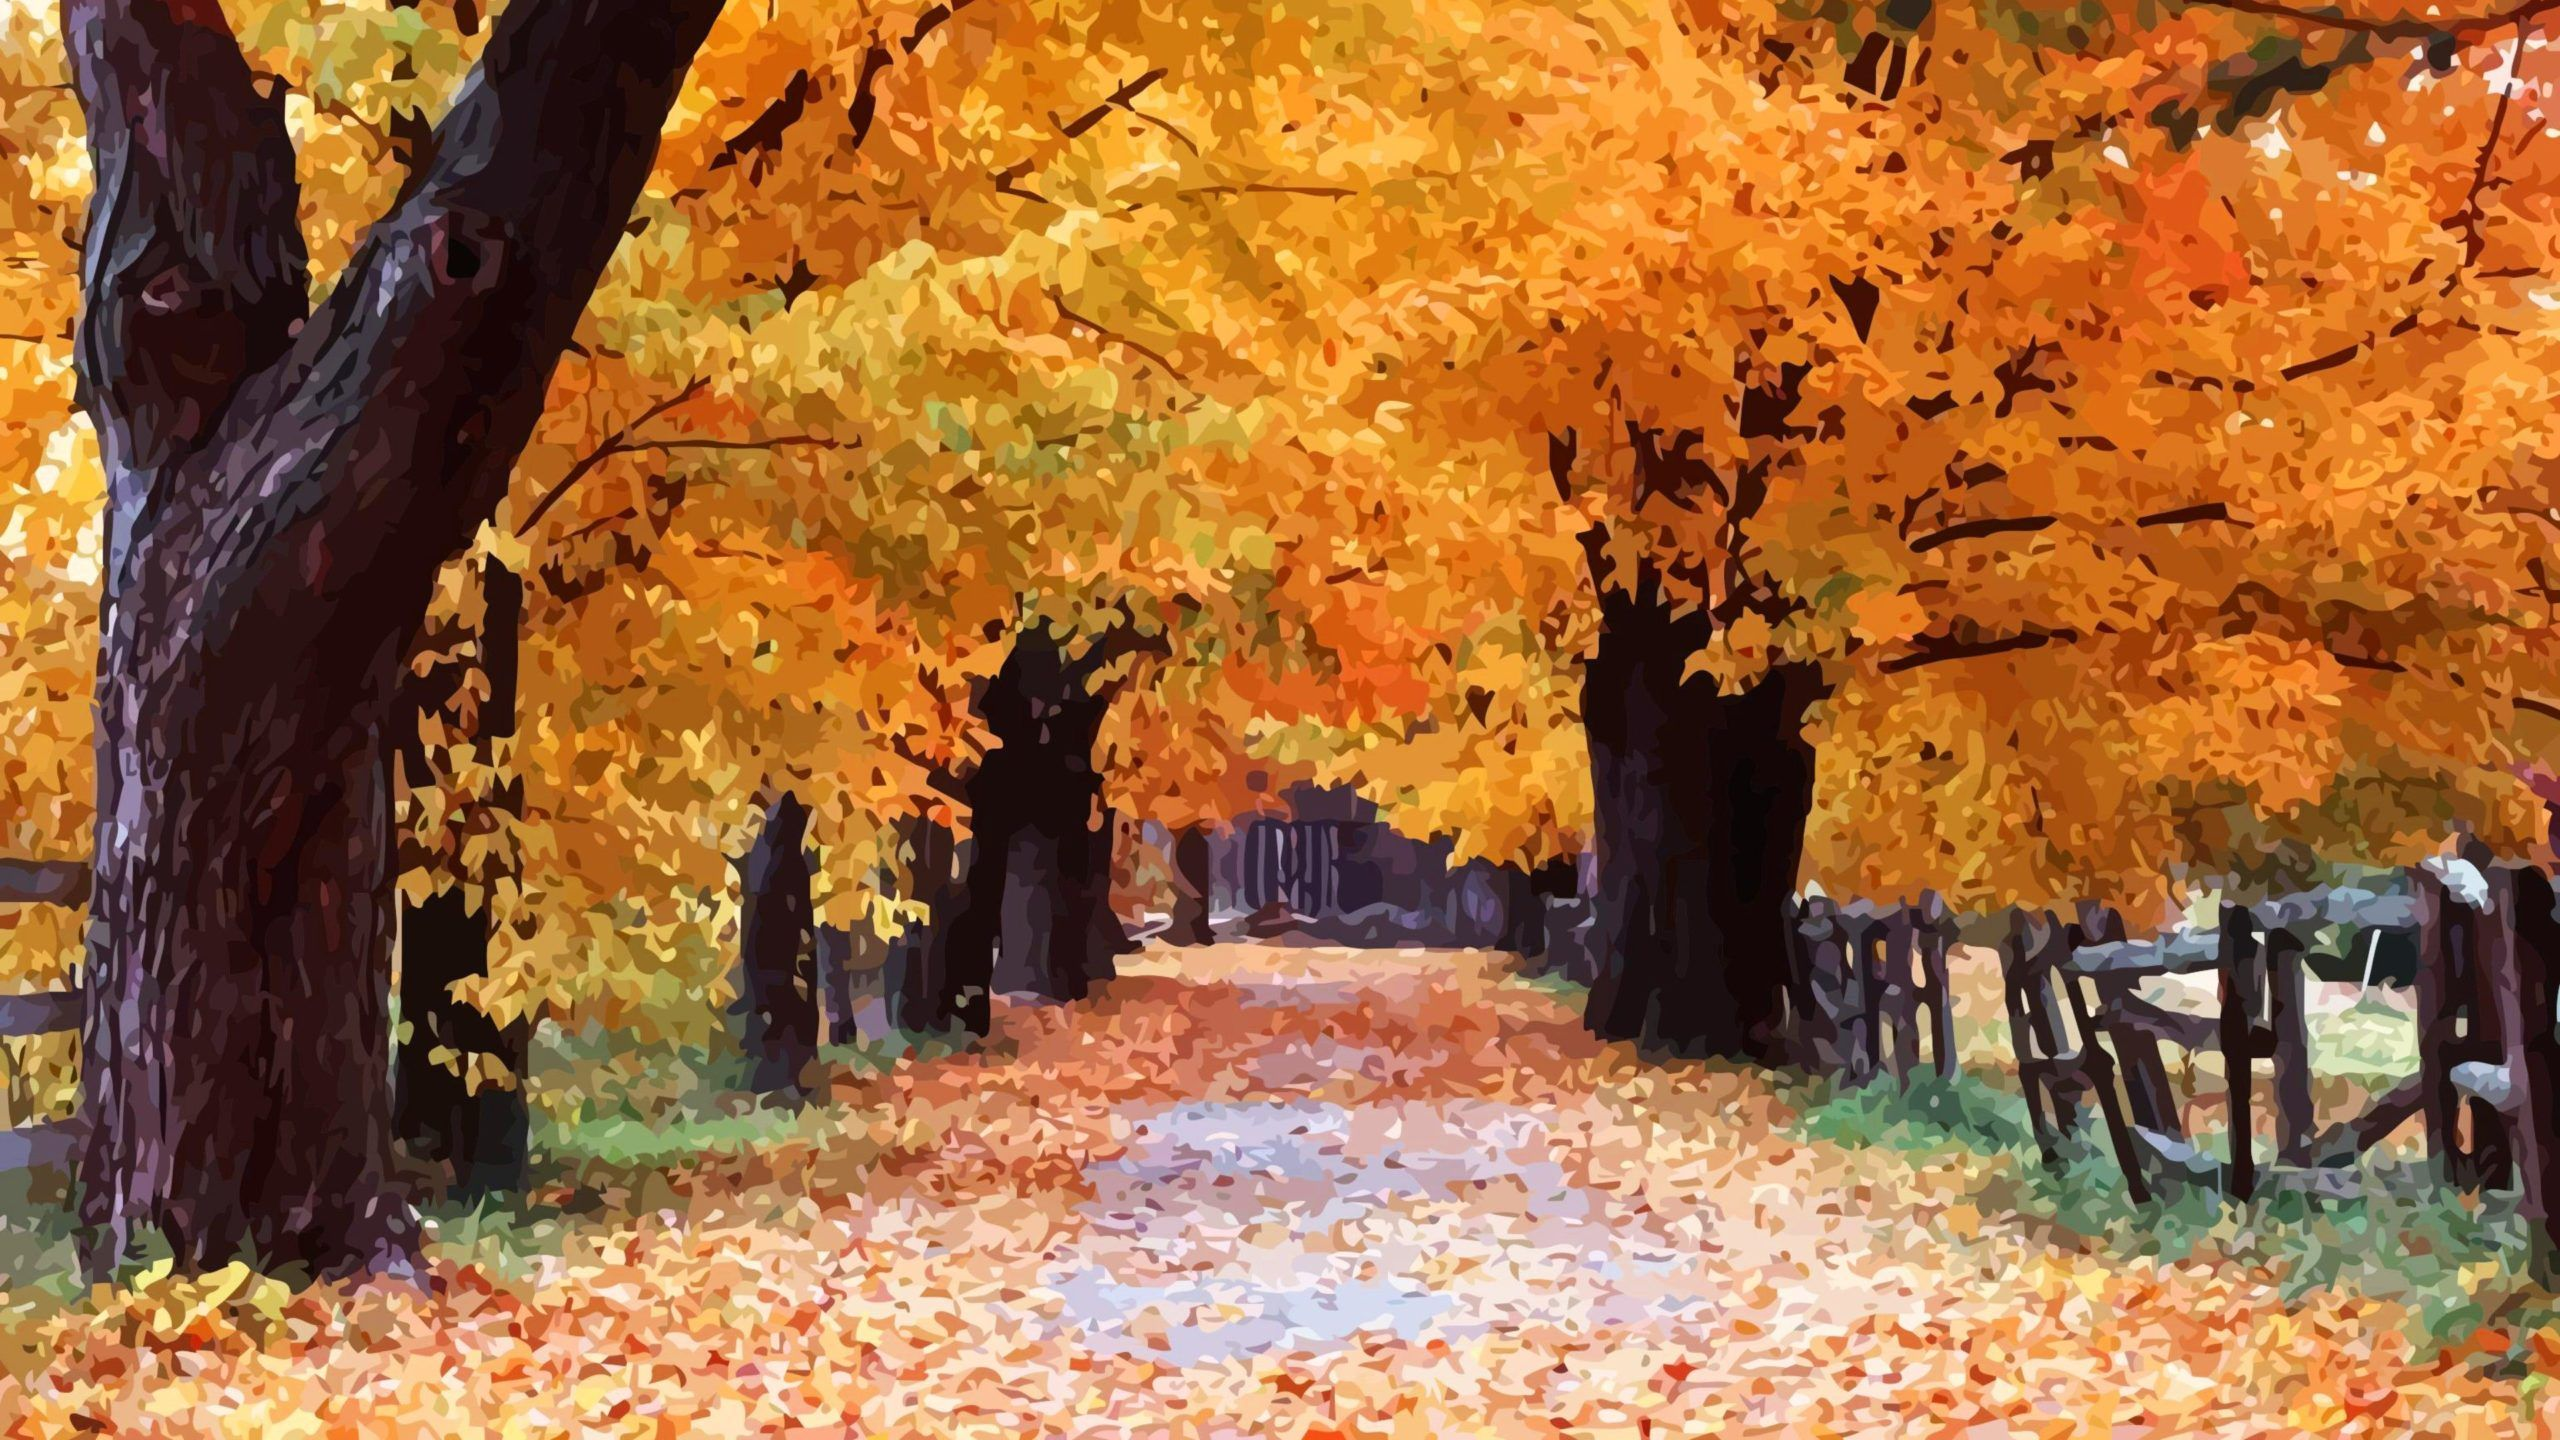 Autumn Home Windows Xp Wallpaper Desktop Wallpaper Fall Scenery Wallpaper Nature Desktop